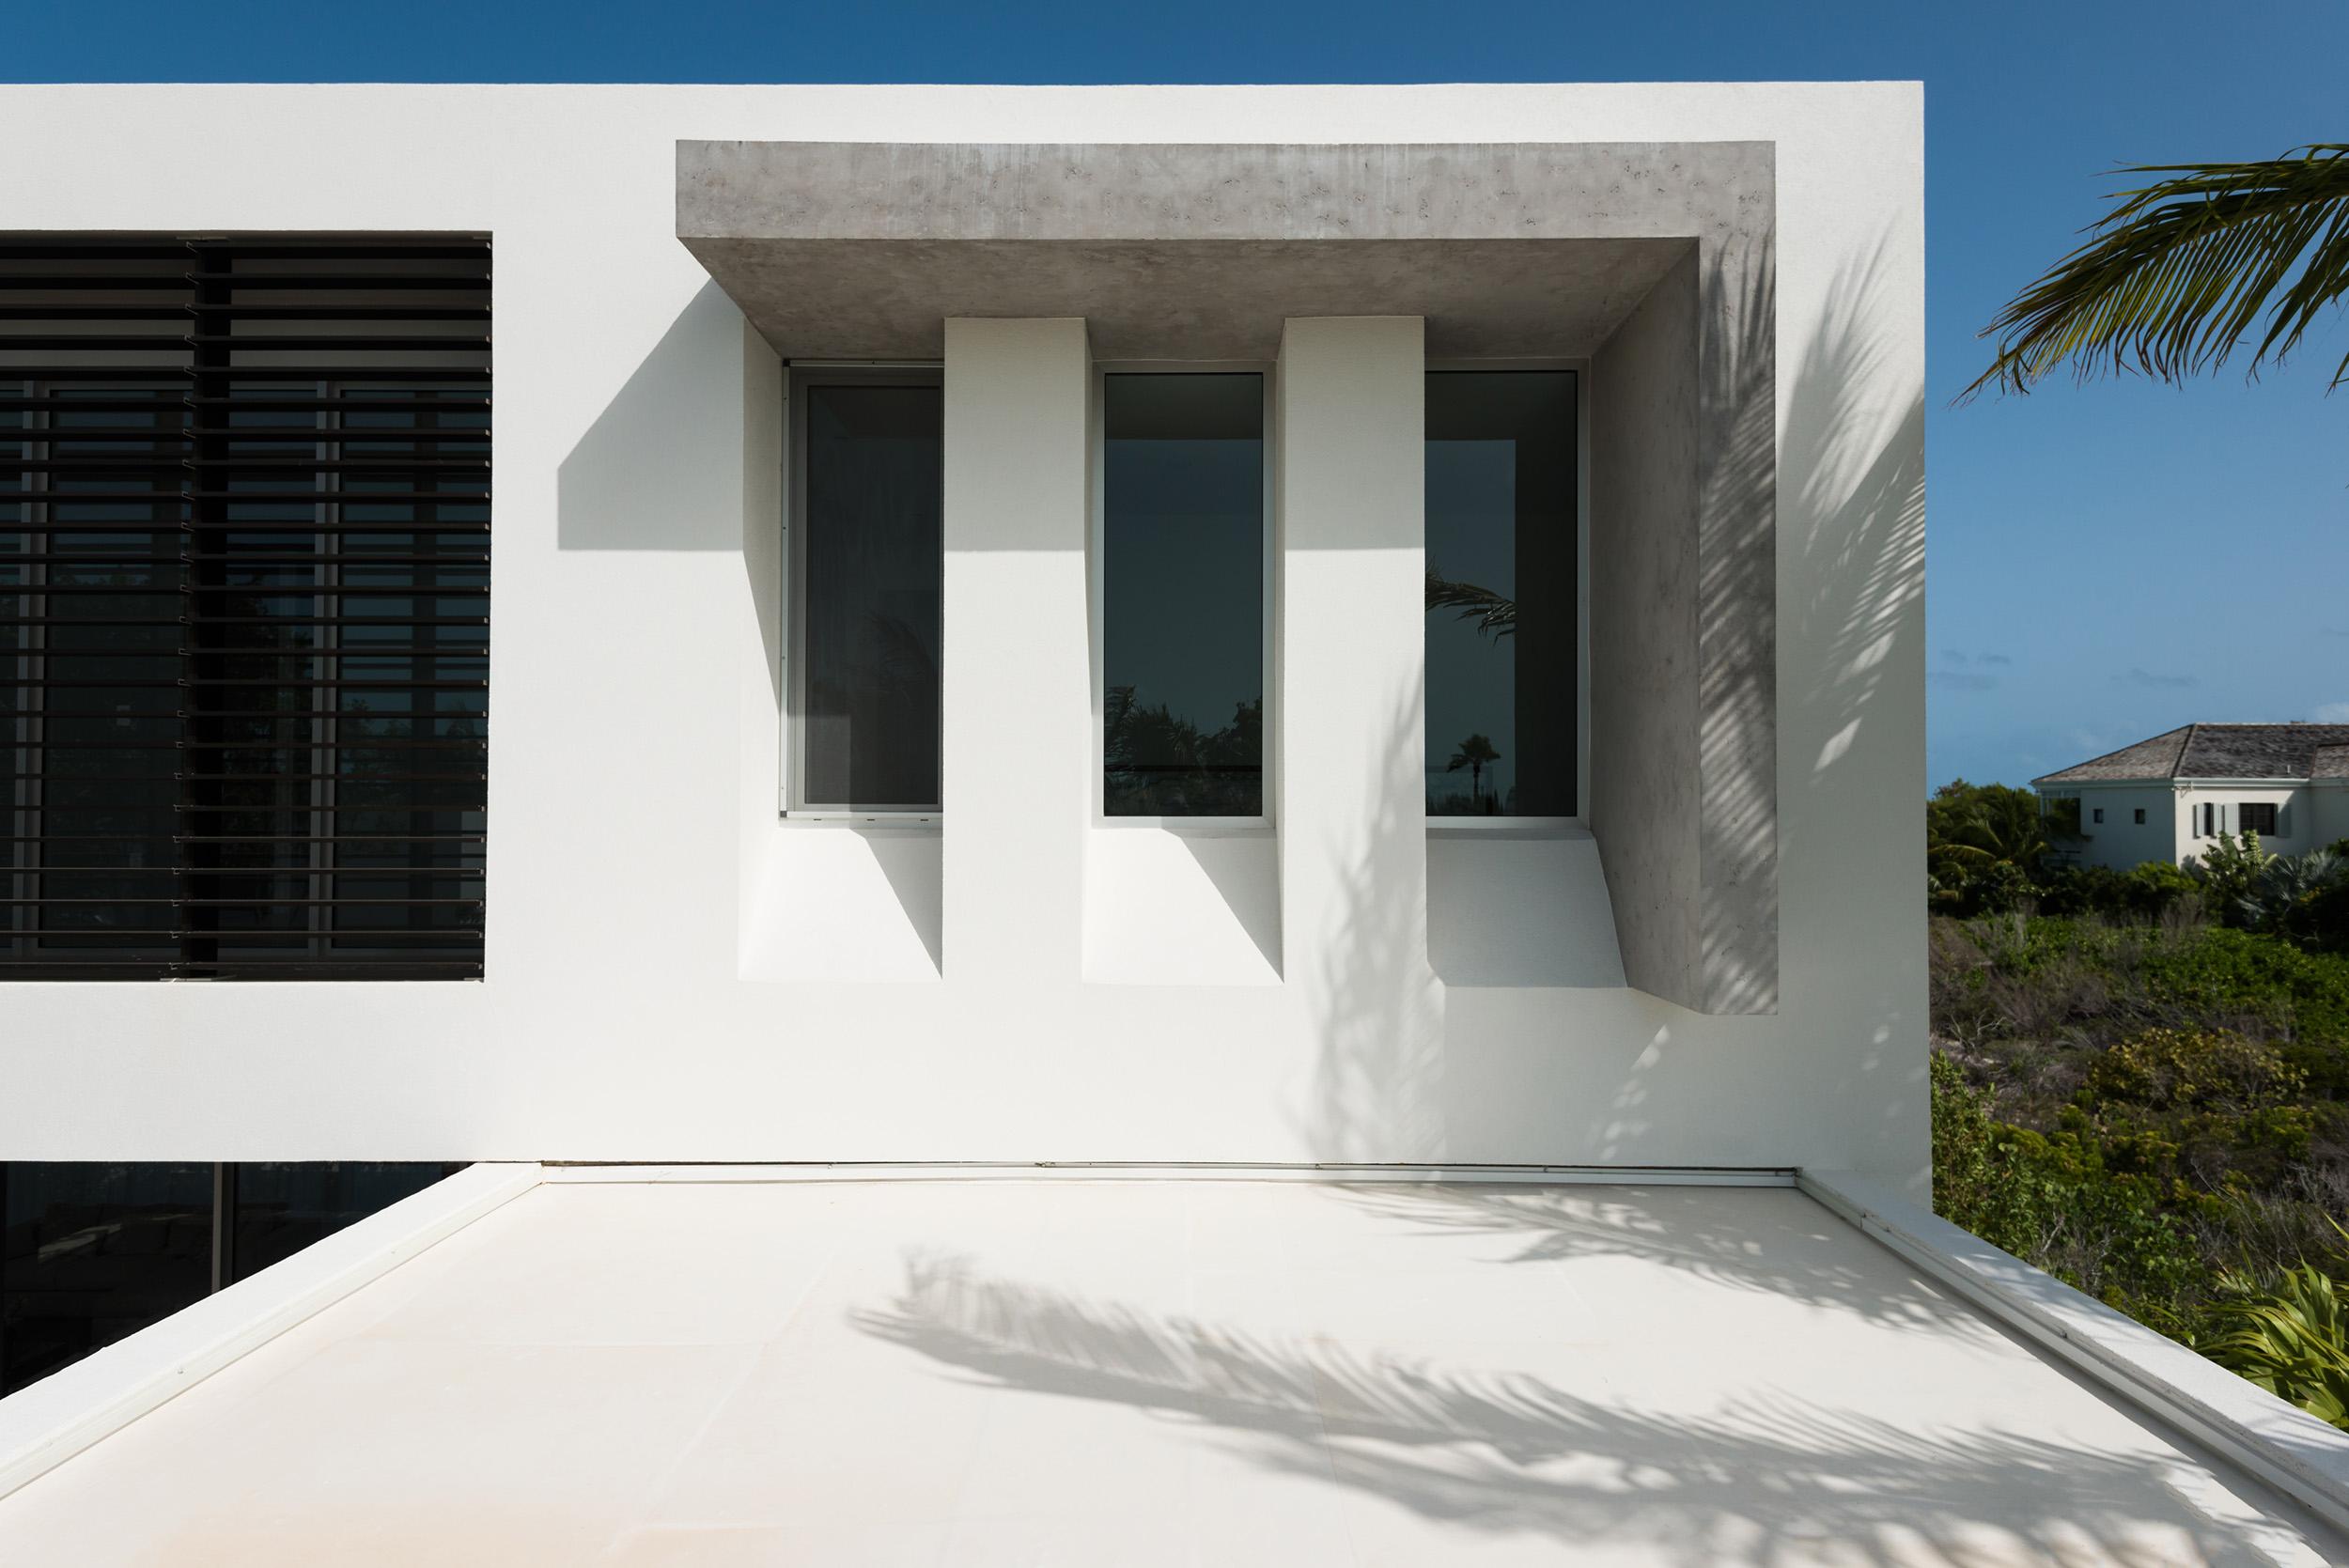 Villa Awa - detail view of the window shading